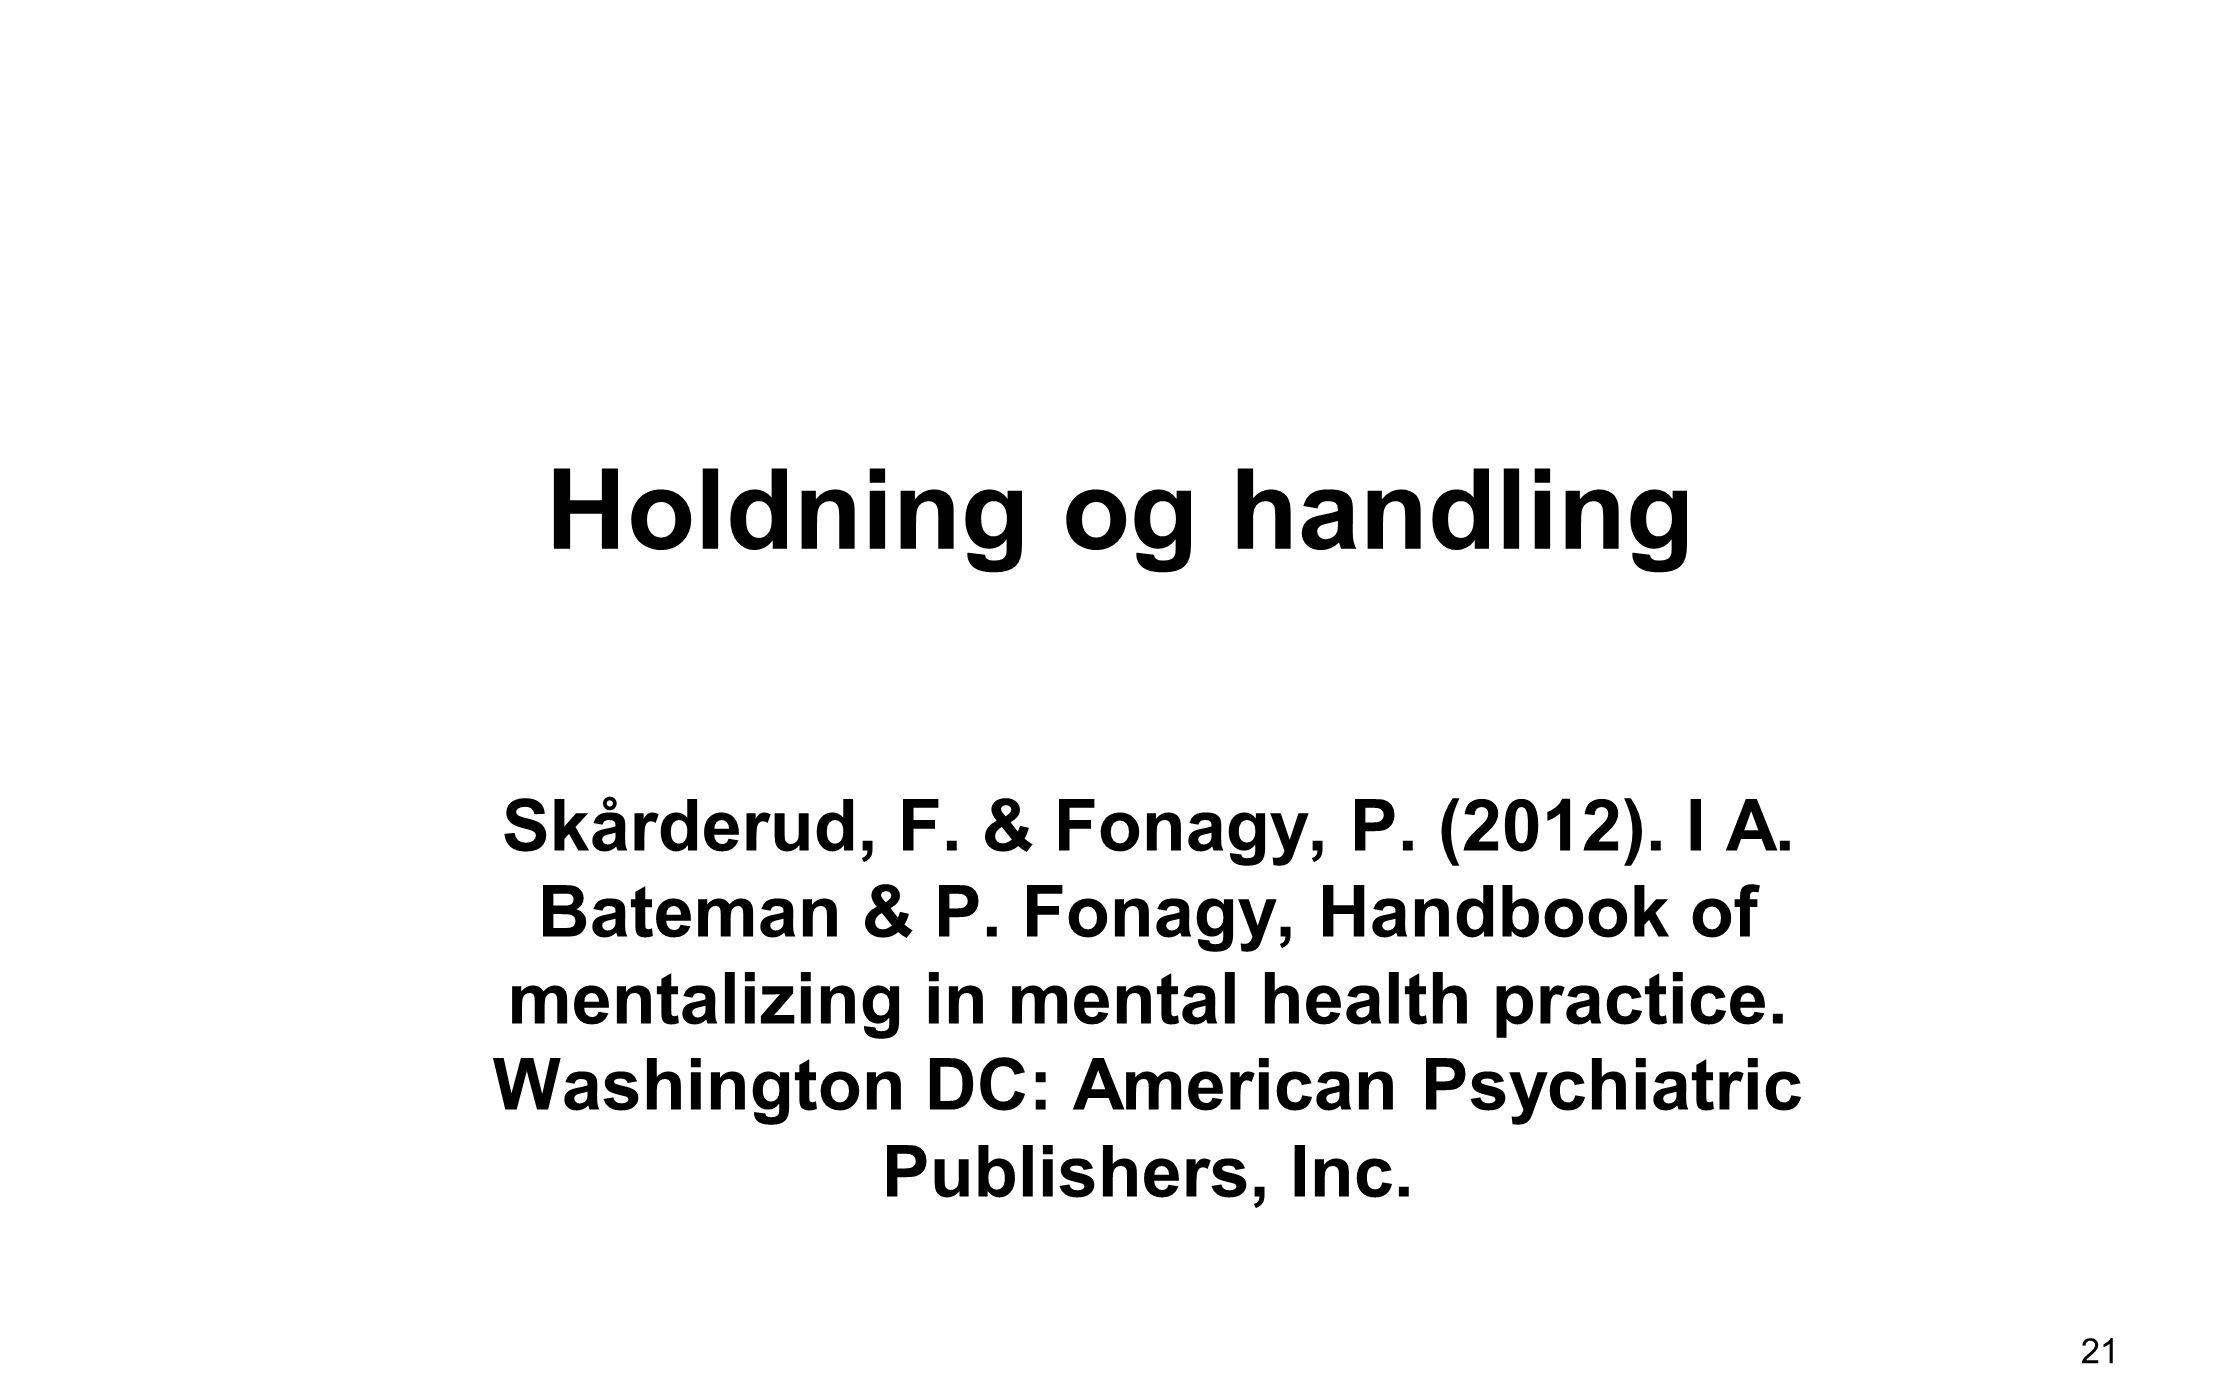 Holdning og handling Skårderud, F. & Fonagy, P. (2012). I A. Bateman & P. Fonagy, Handbook of mentalizing in mental health practice. Washington DC: Am